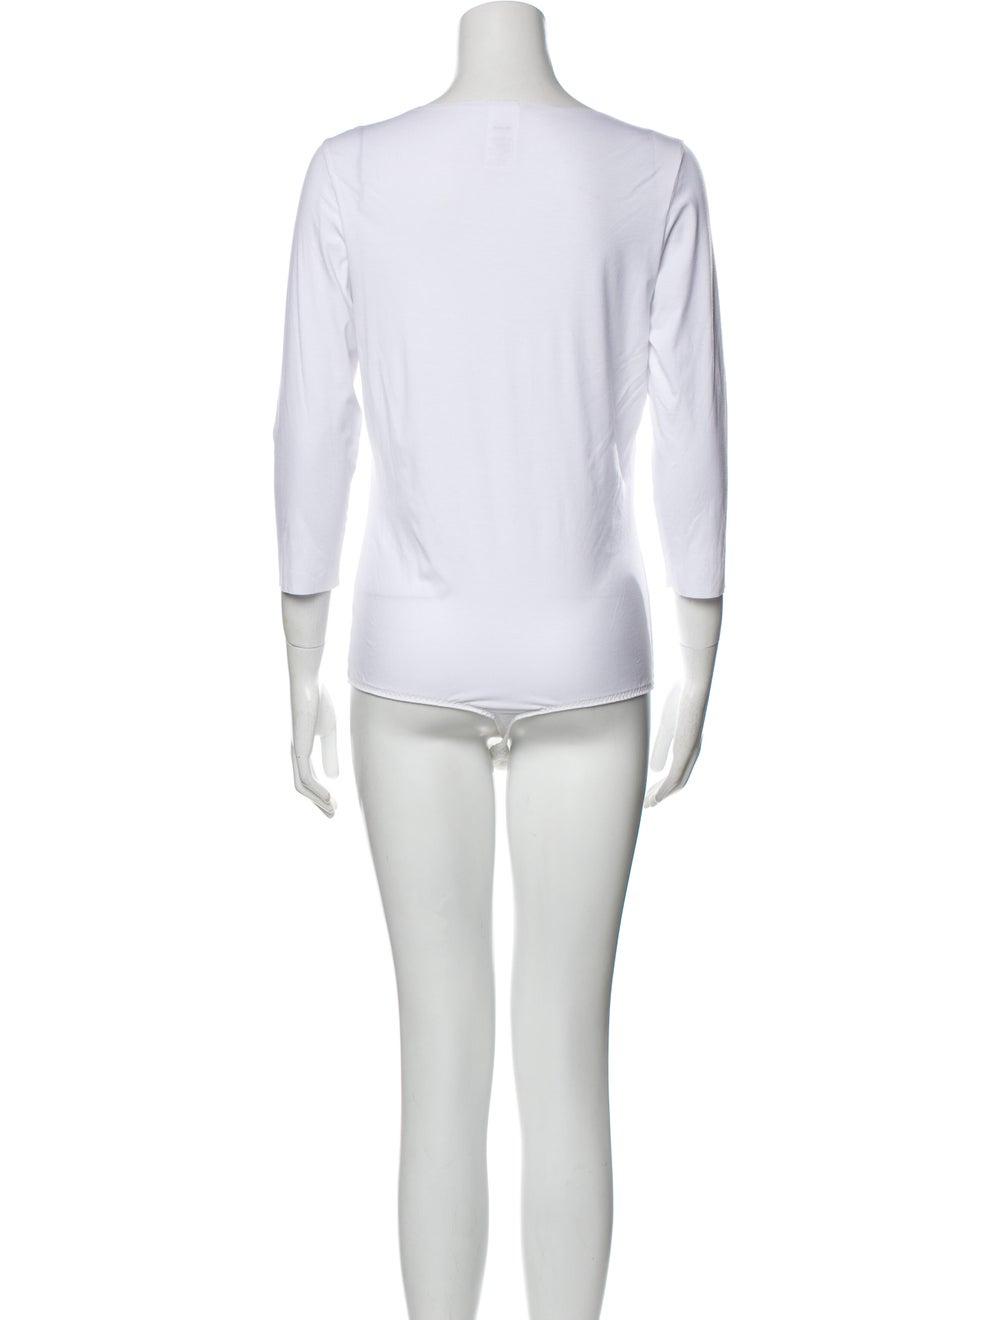 Wolford Bodysuit Scoop Neck Bodysuit White - image 3